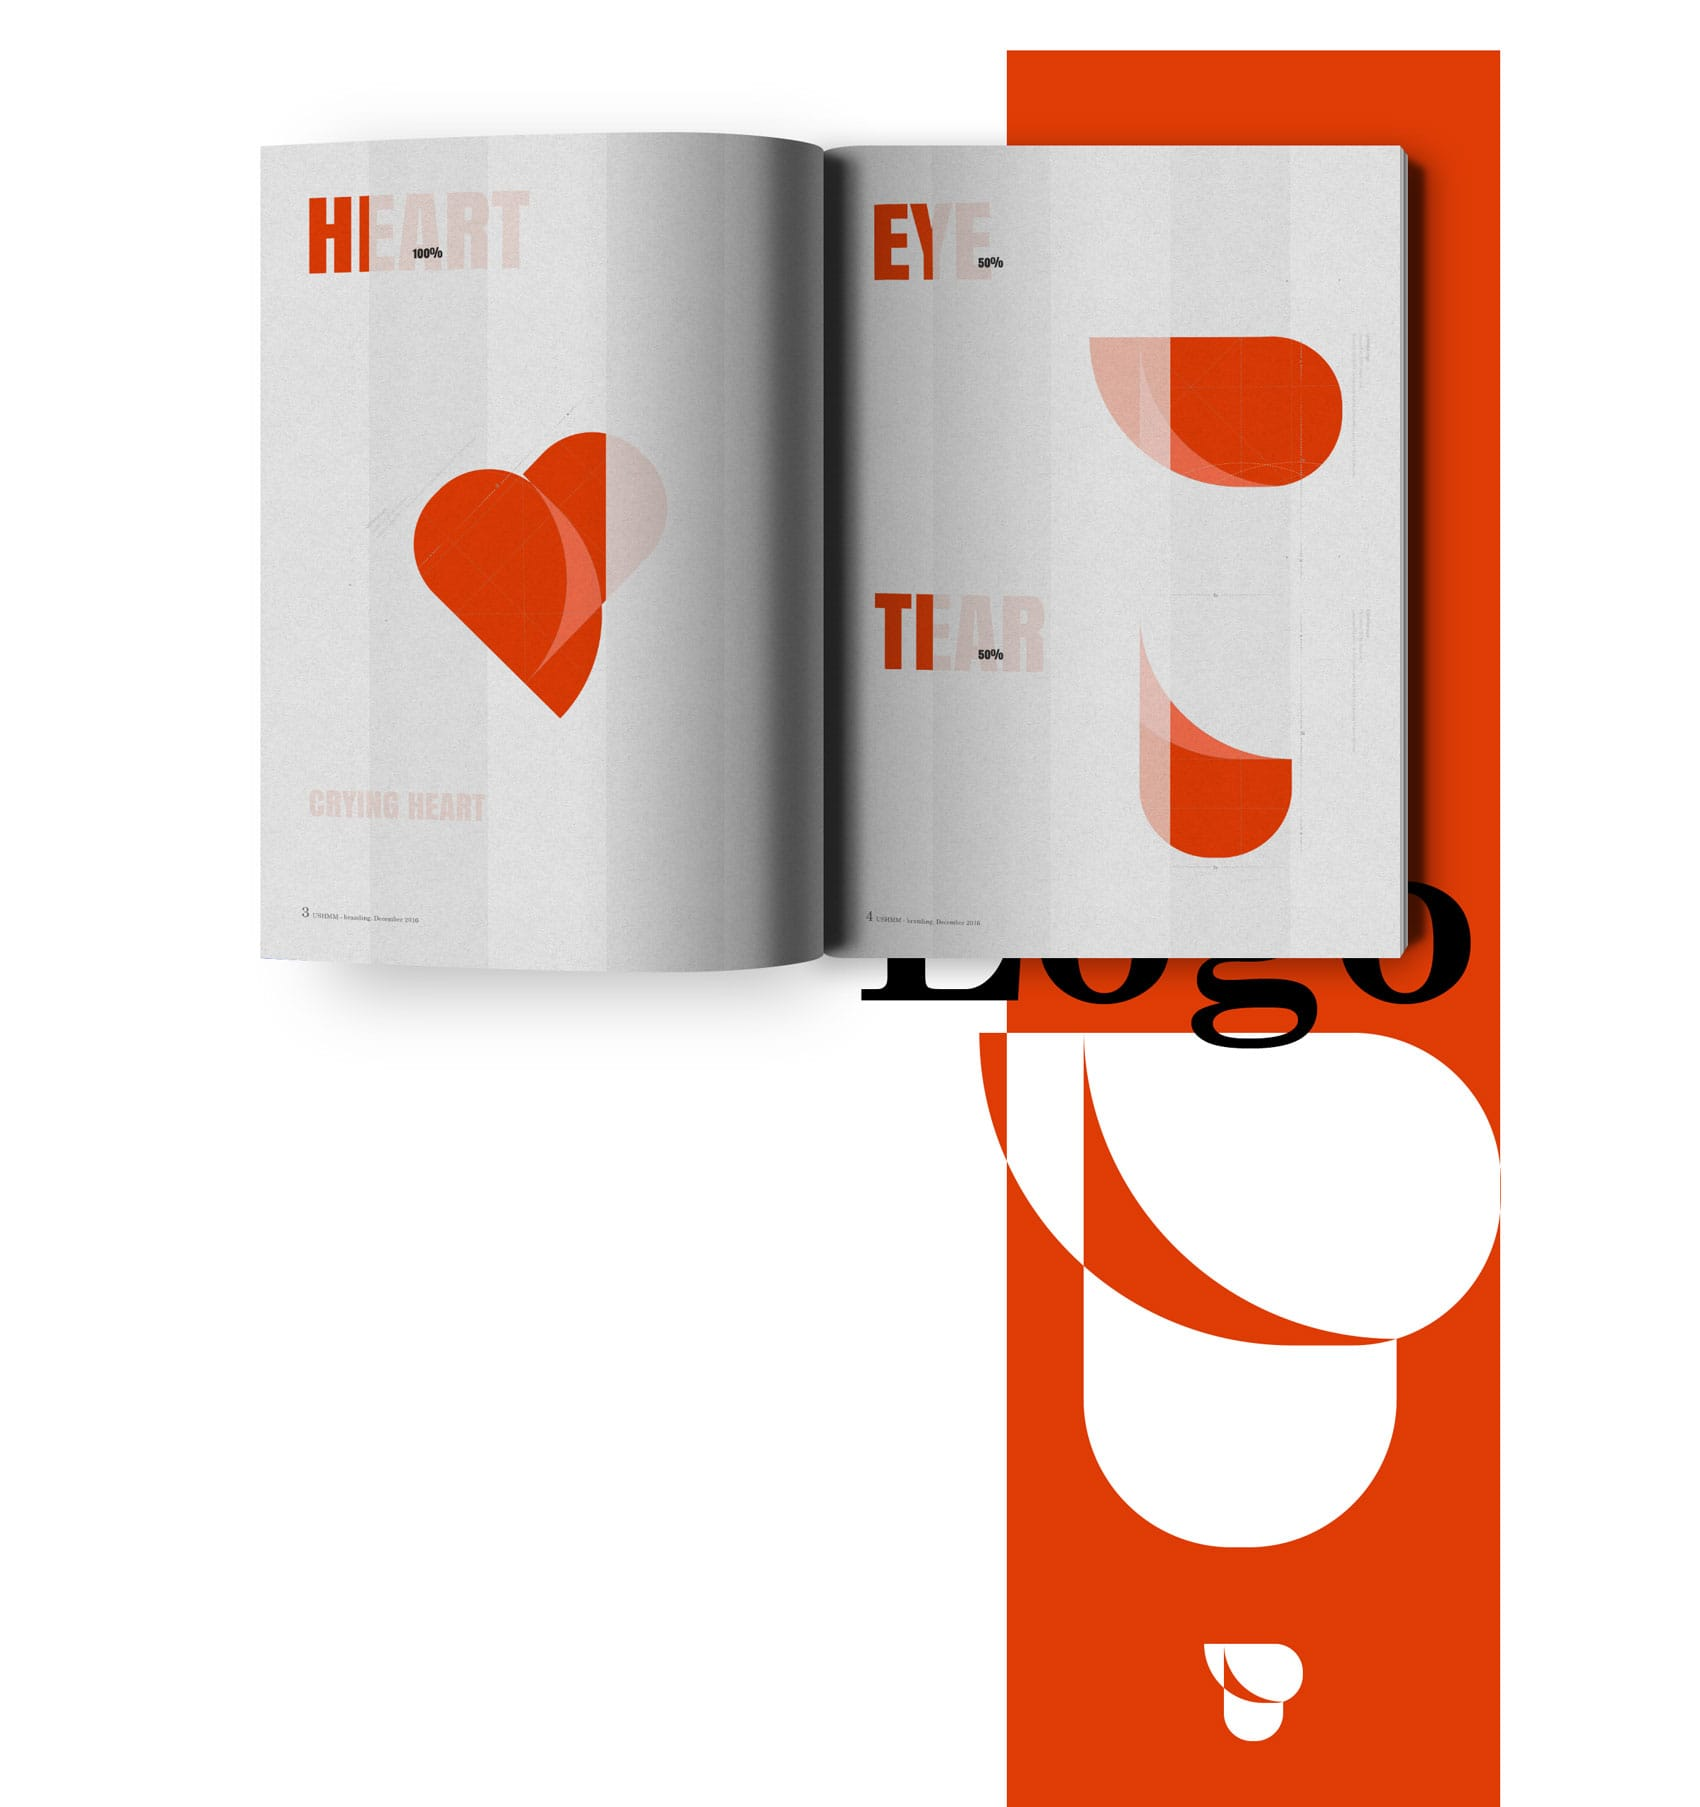 USHMM logo concept illustration